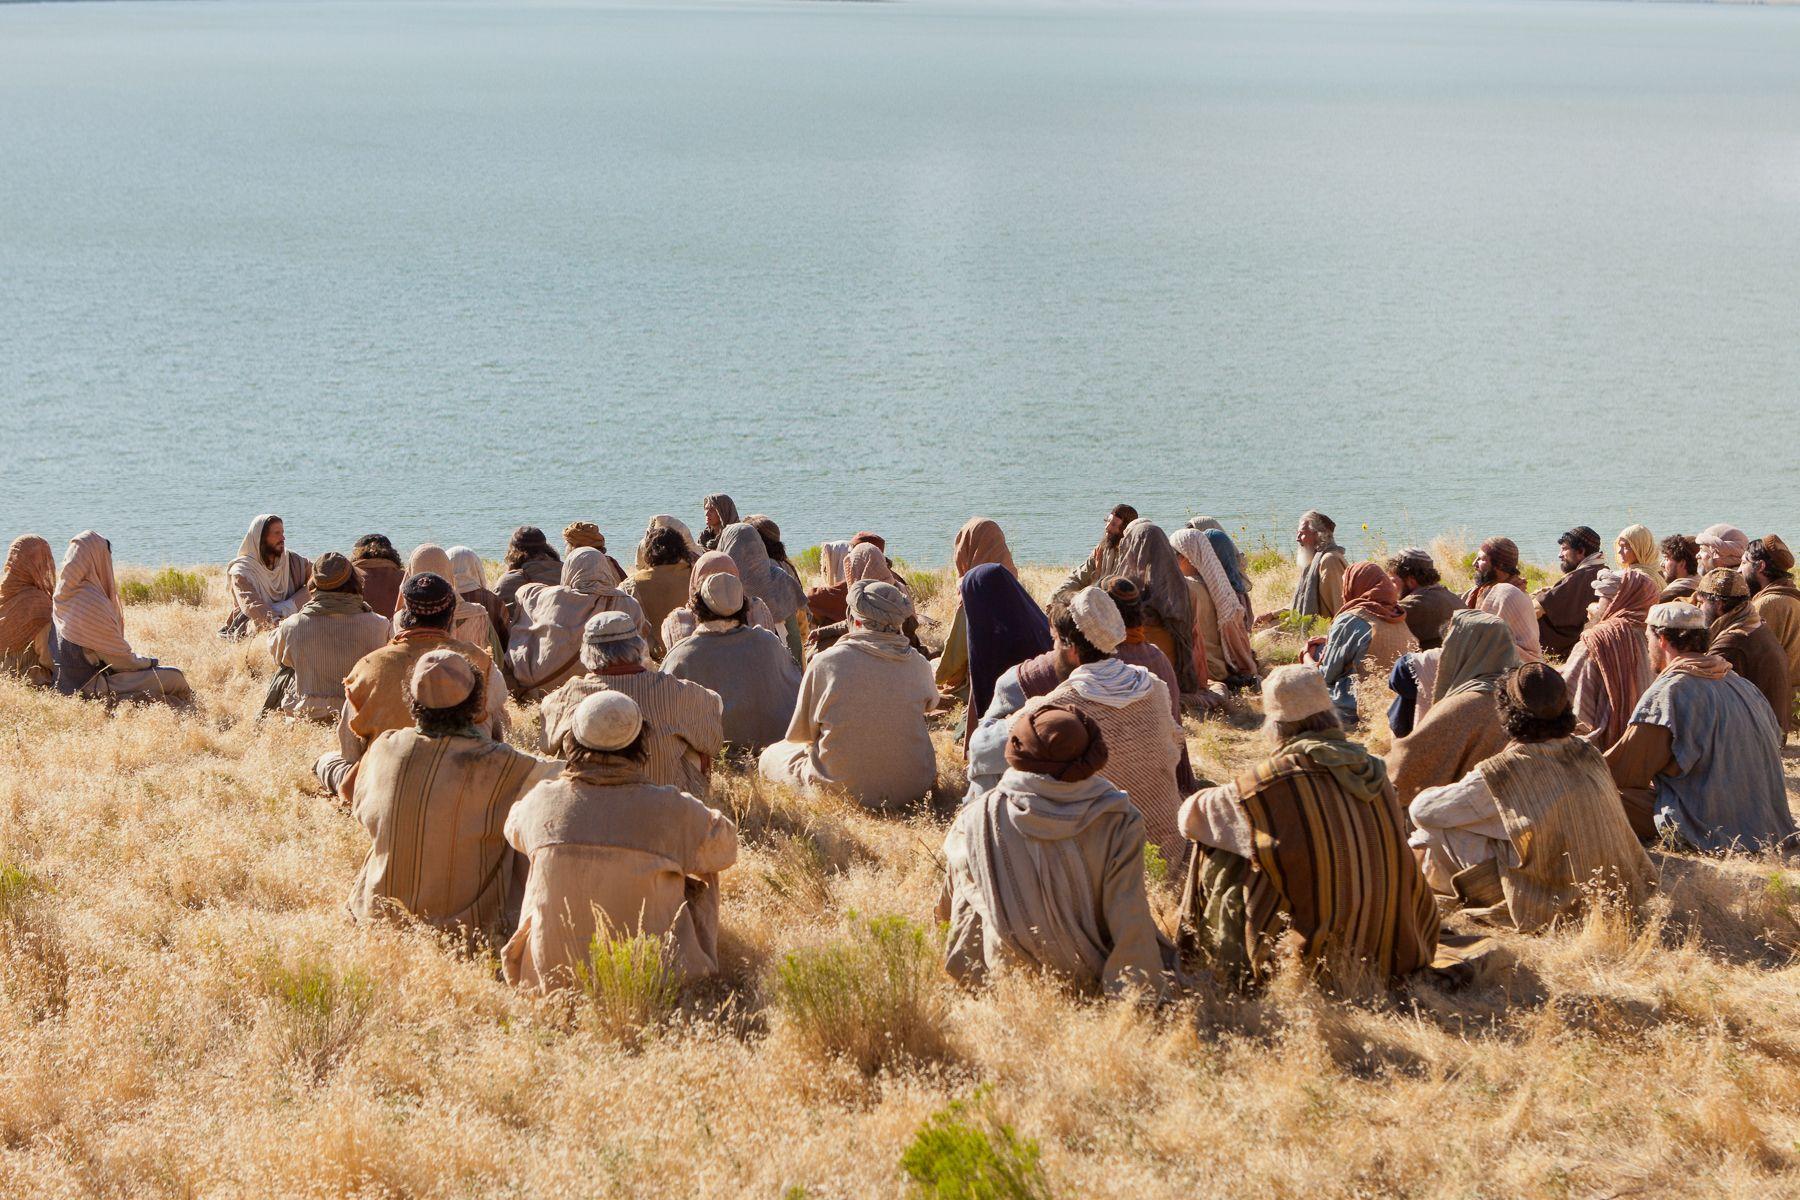 jesus-teaches-how-to-pray.jpg (JPEG Image, 1800×1200 pixels) - Scaled (76%)